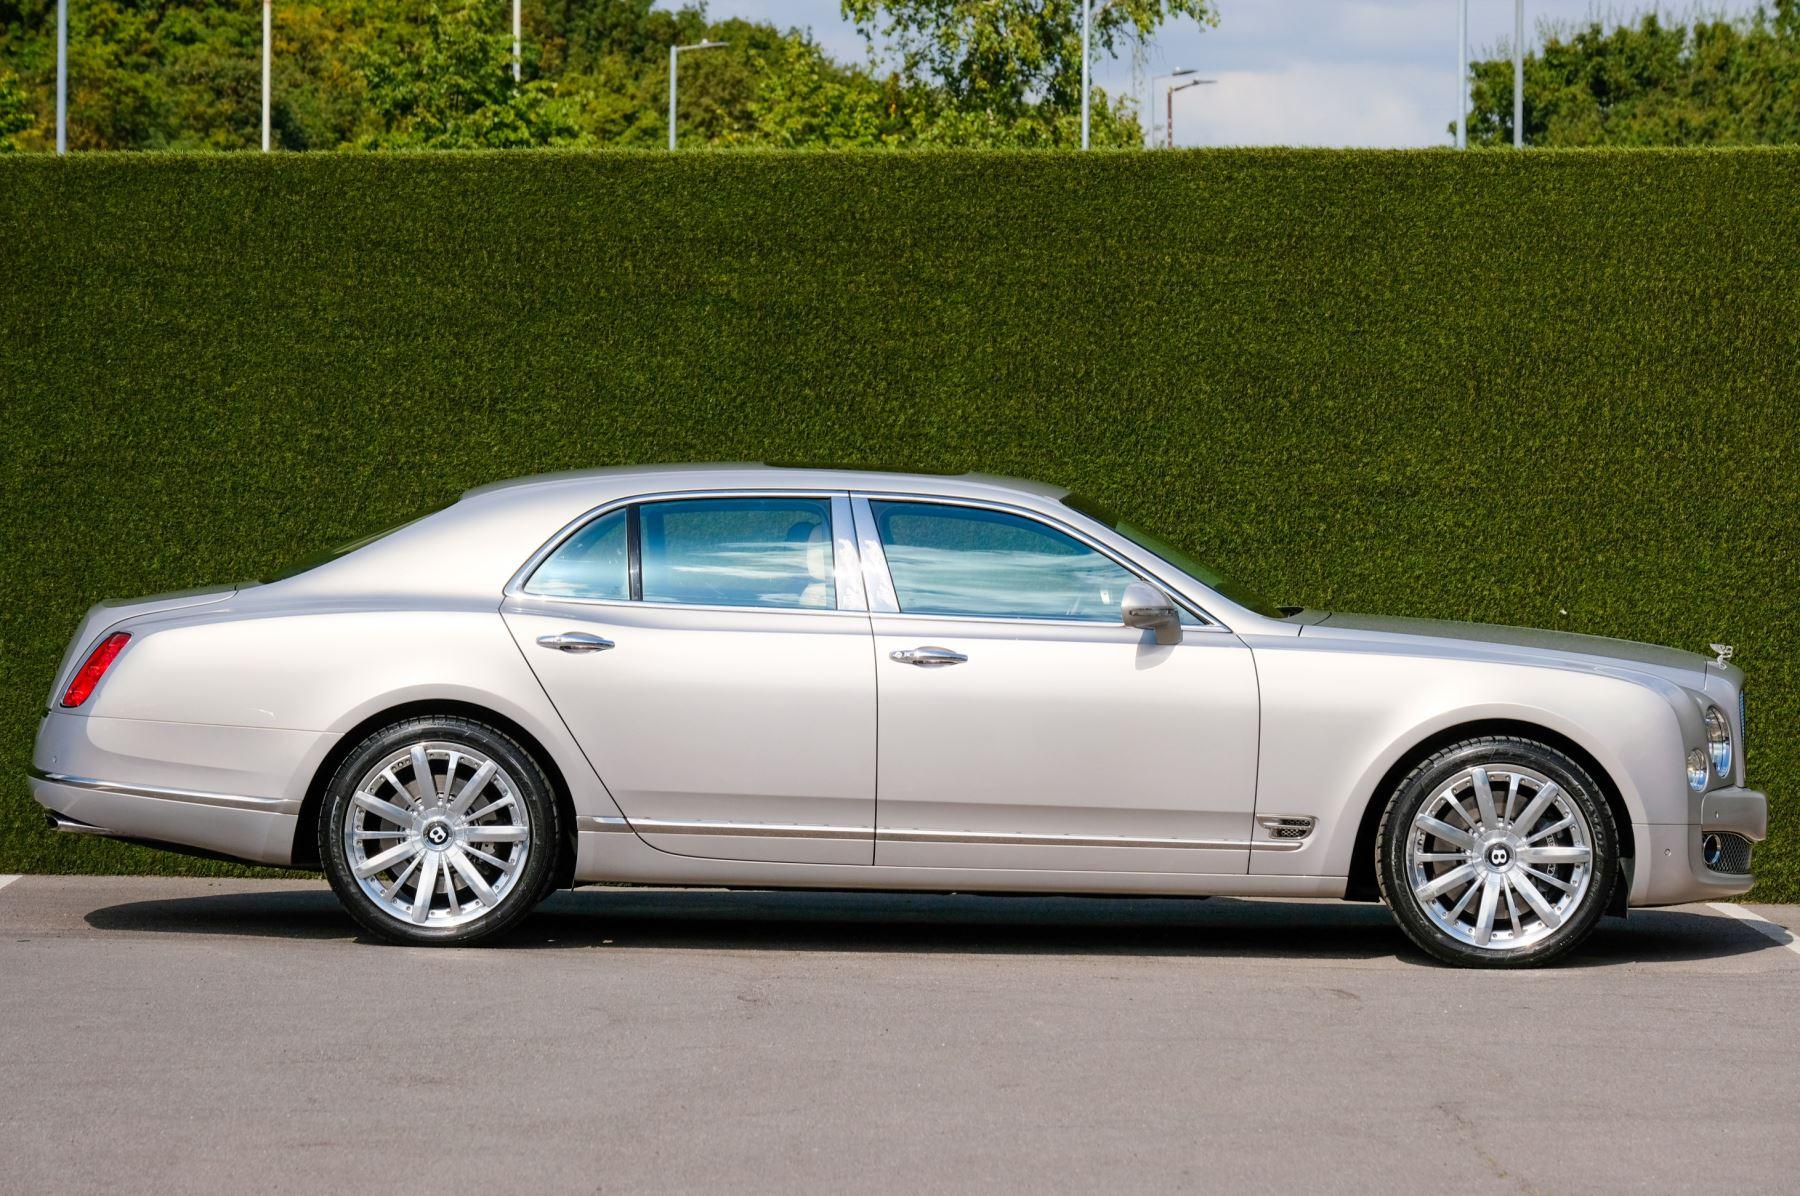 Bentley Mulsanne 6.8 V8 Mulliner Driving Spec - Naim For Bentley Premium Audio image 3